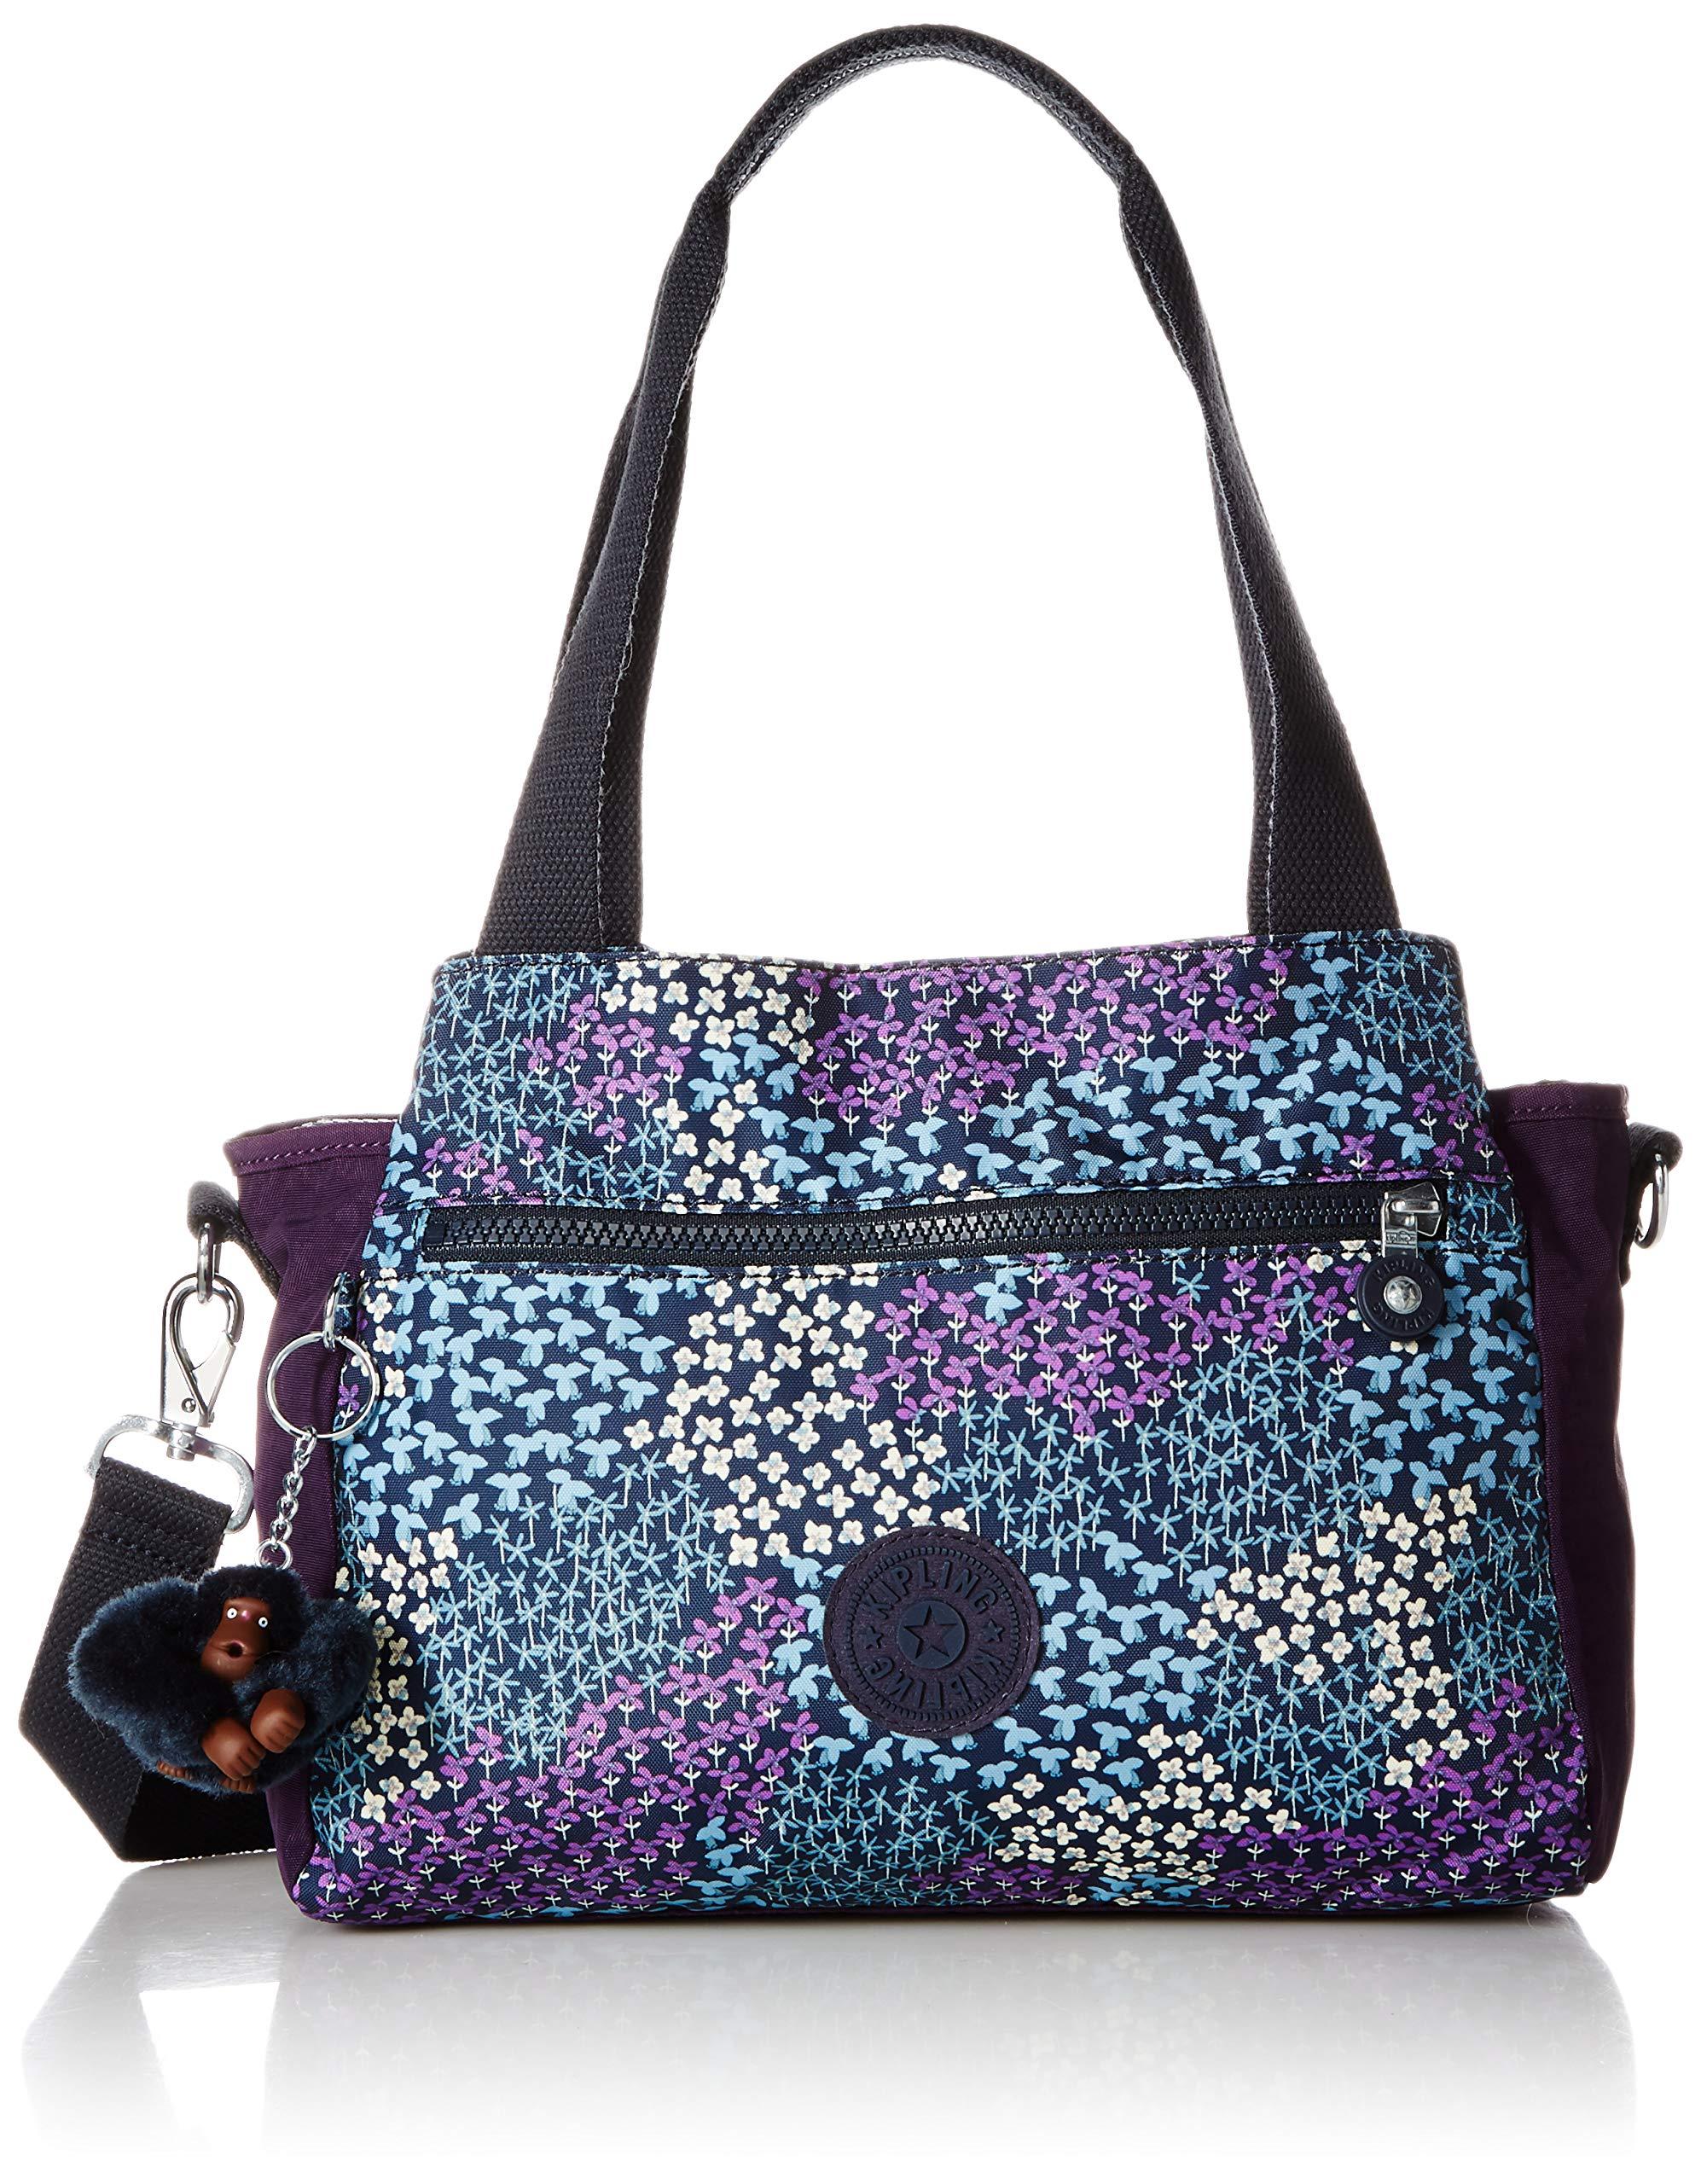 Kipling Elysia Printed Handbag, Dotted Bouquet, Combo